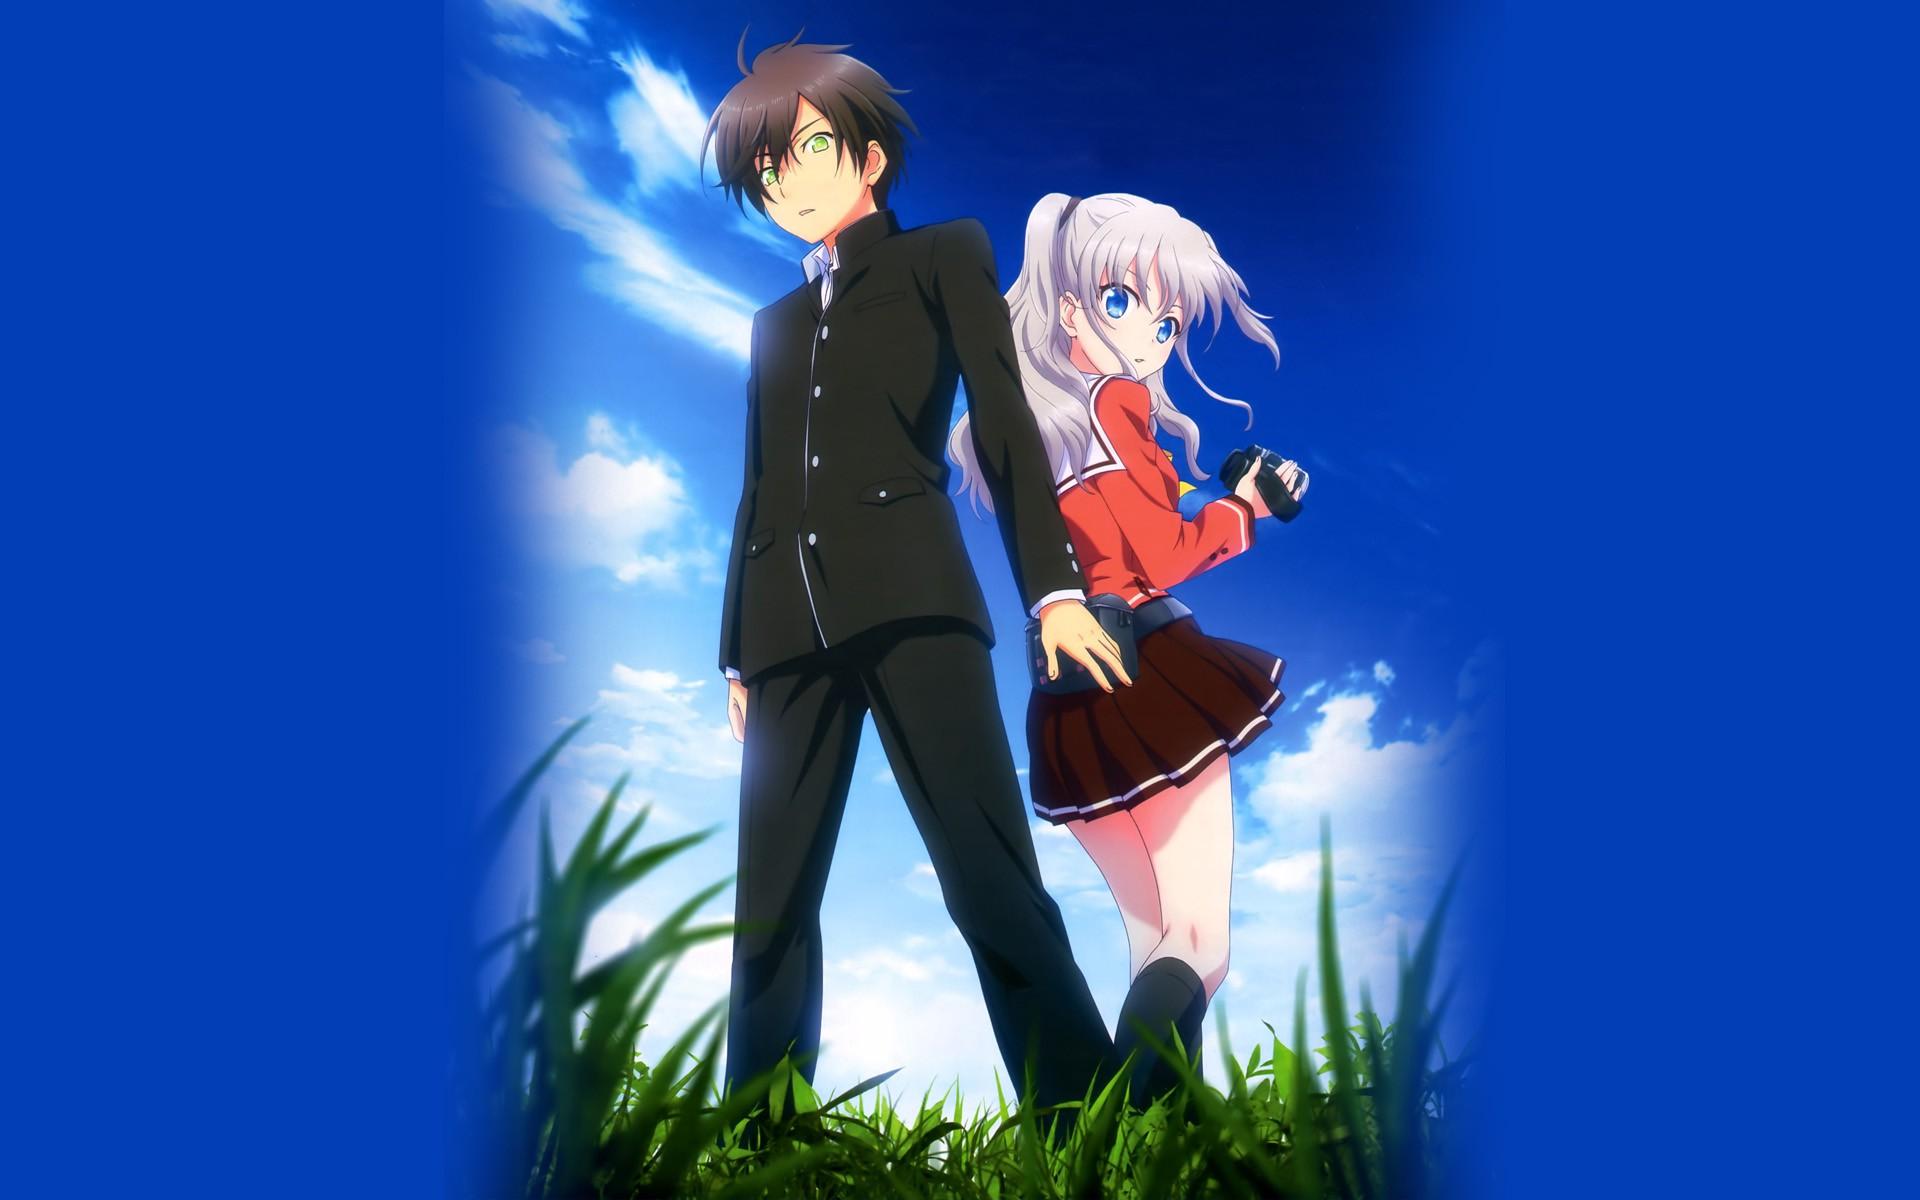 anime couple wallpaper